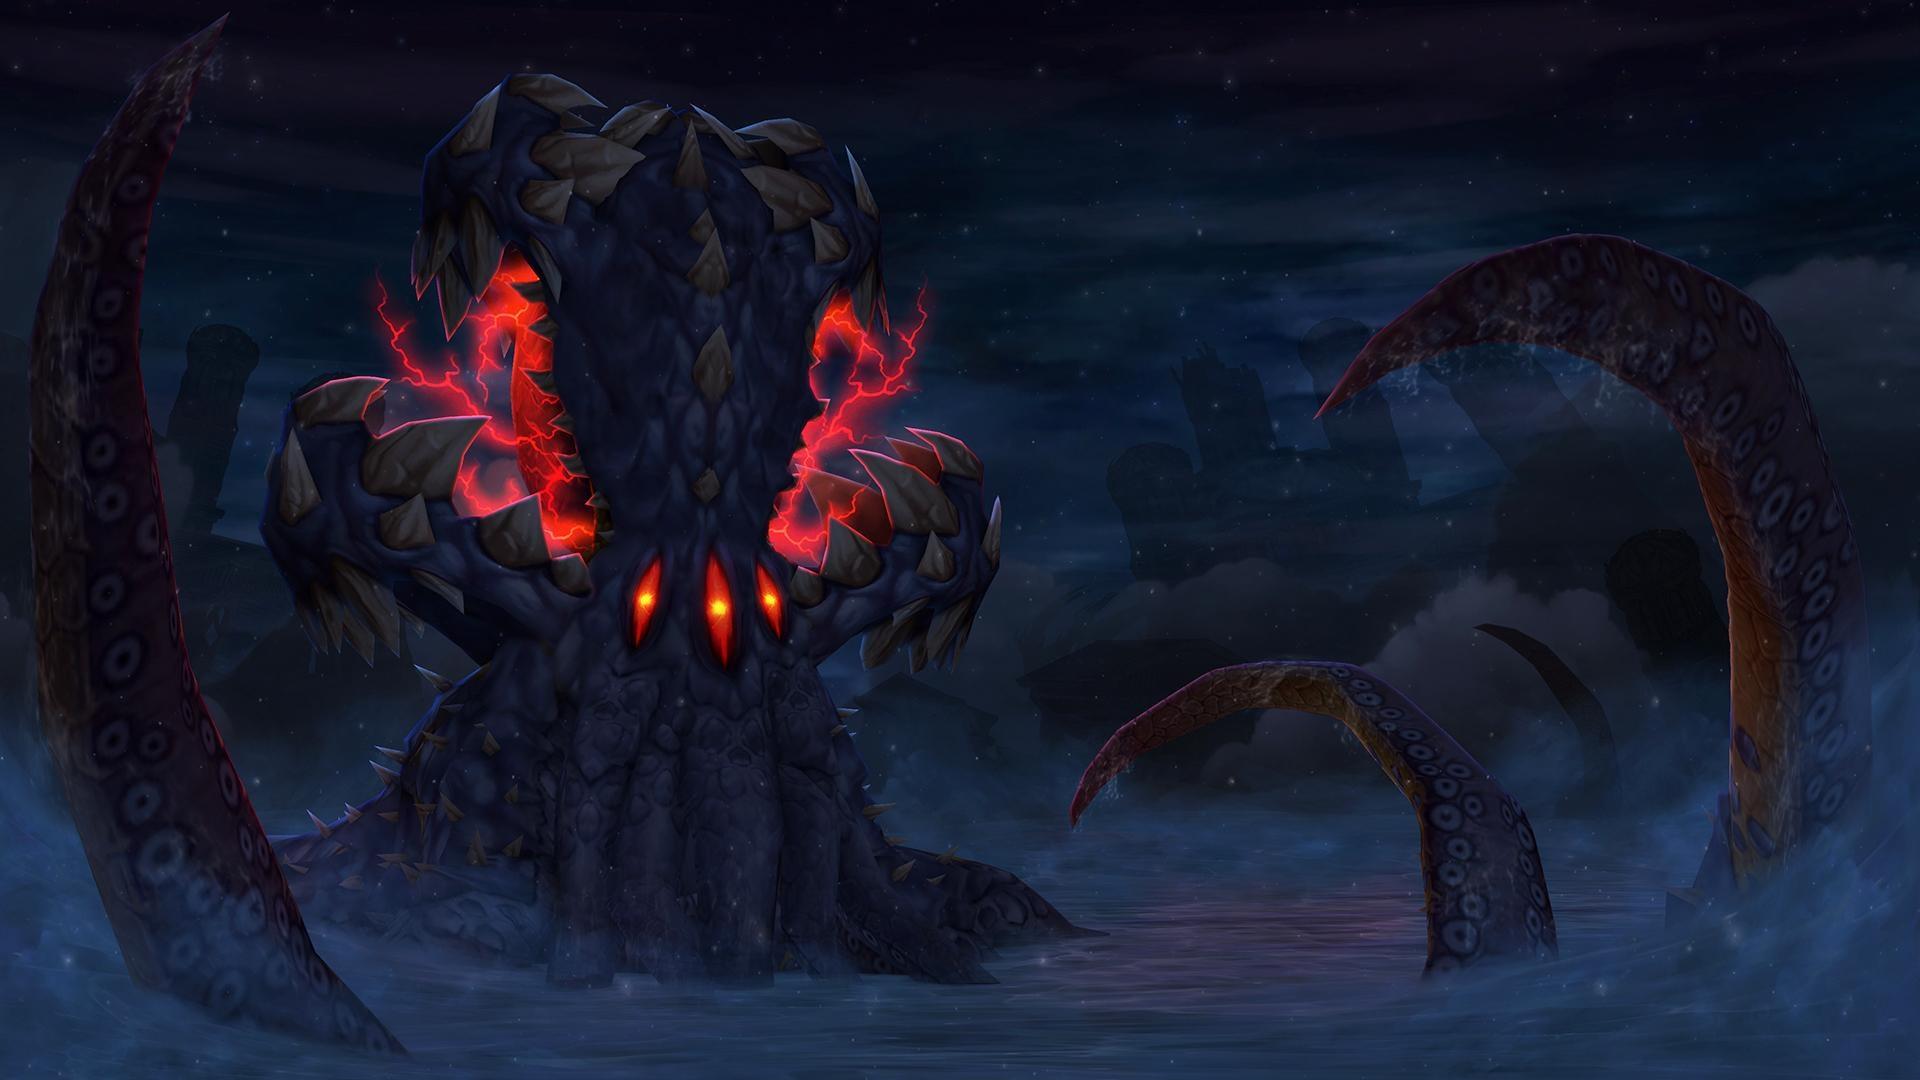 World of Warcraft: Battle for Azeroth; screenshot: N'zoth